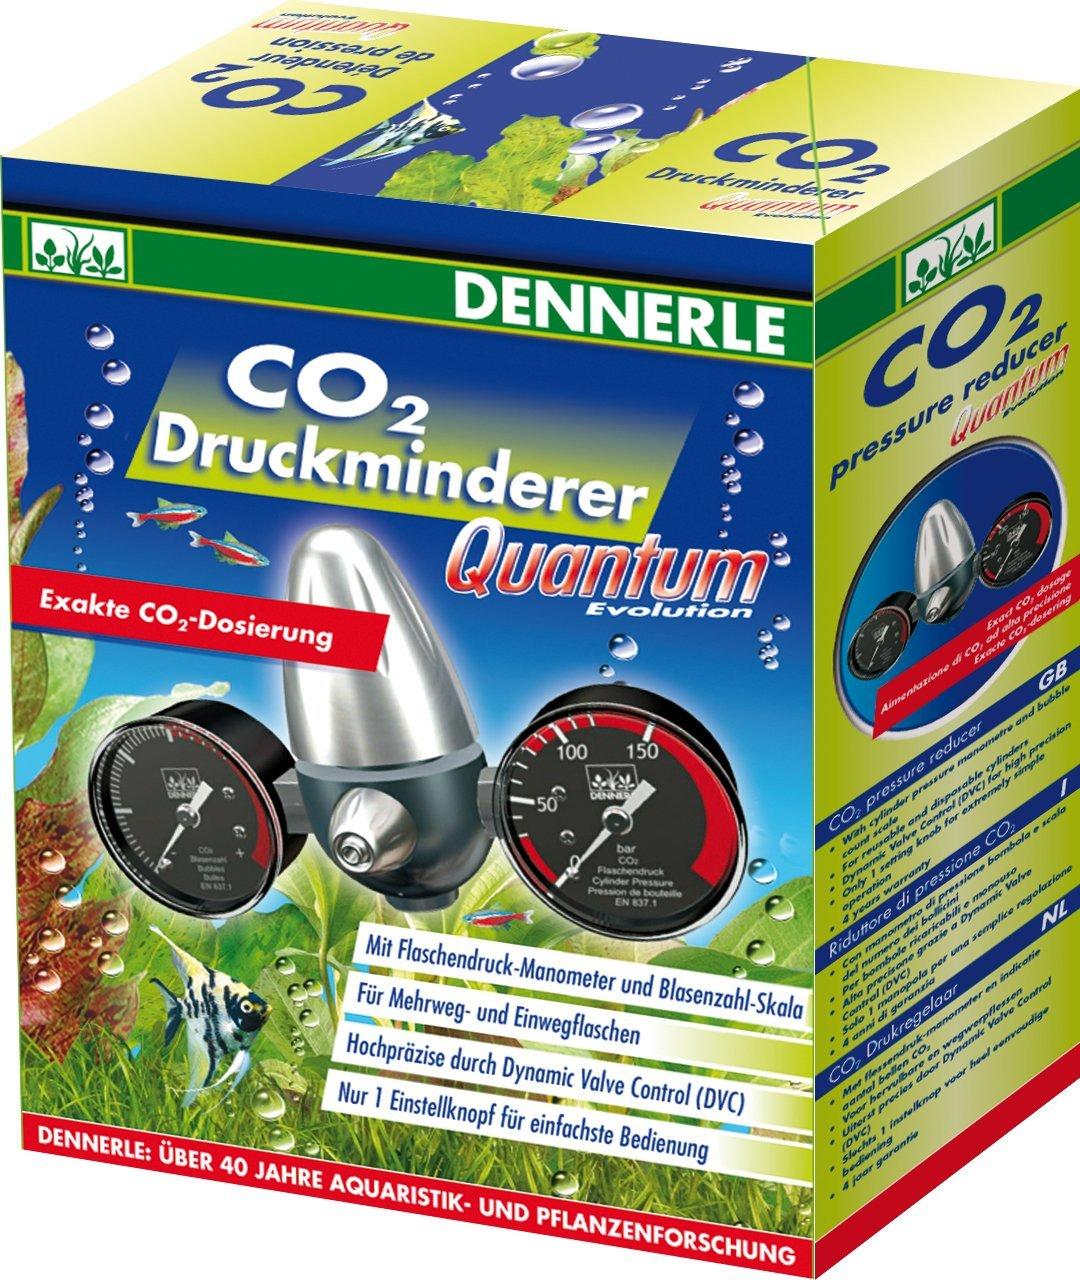 Dennerle 7004015 CO2 Druckminderer Quantum